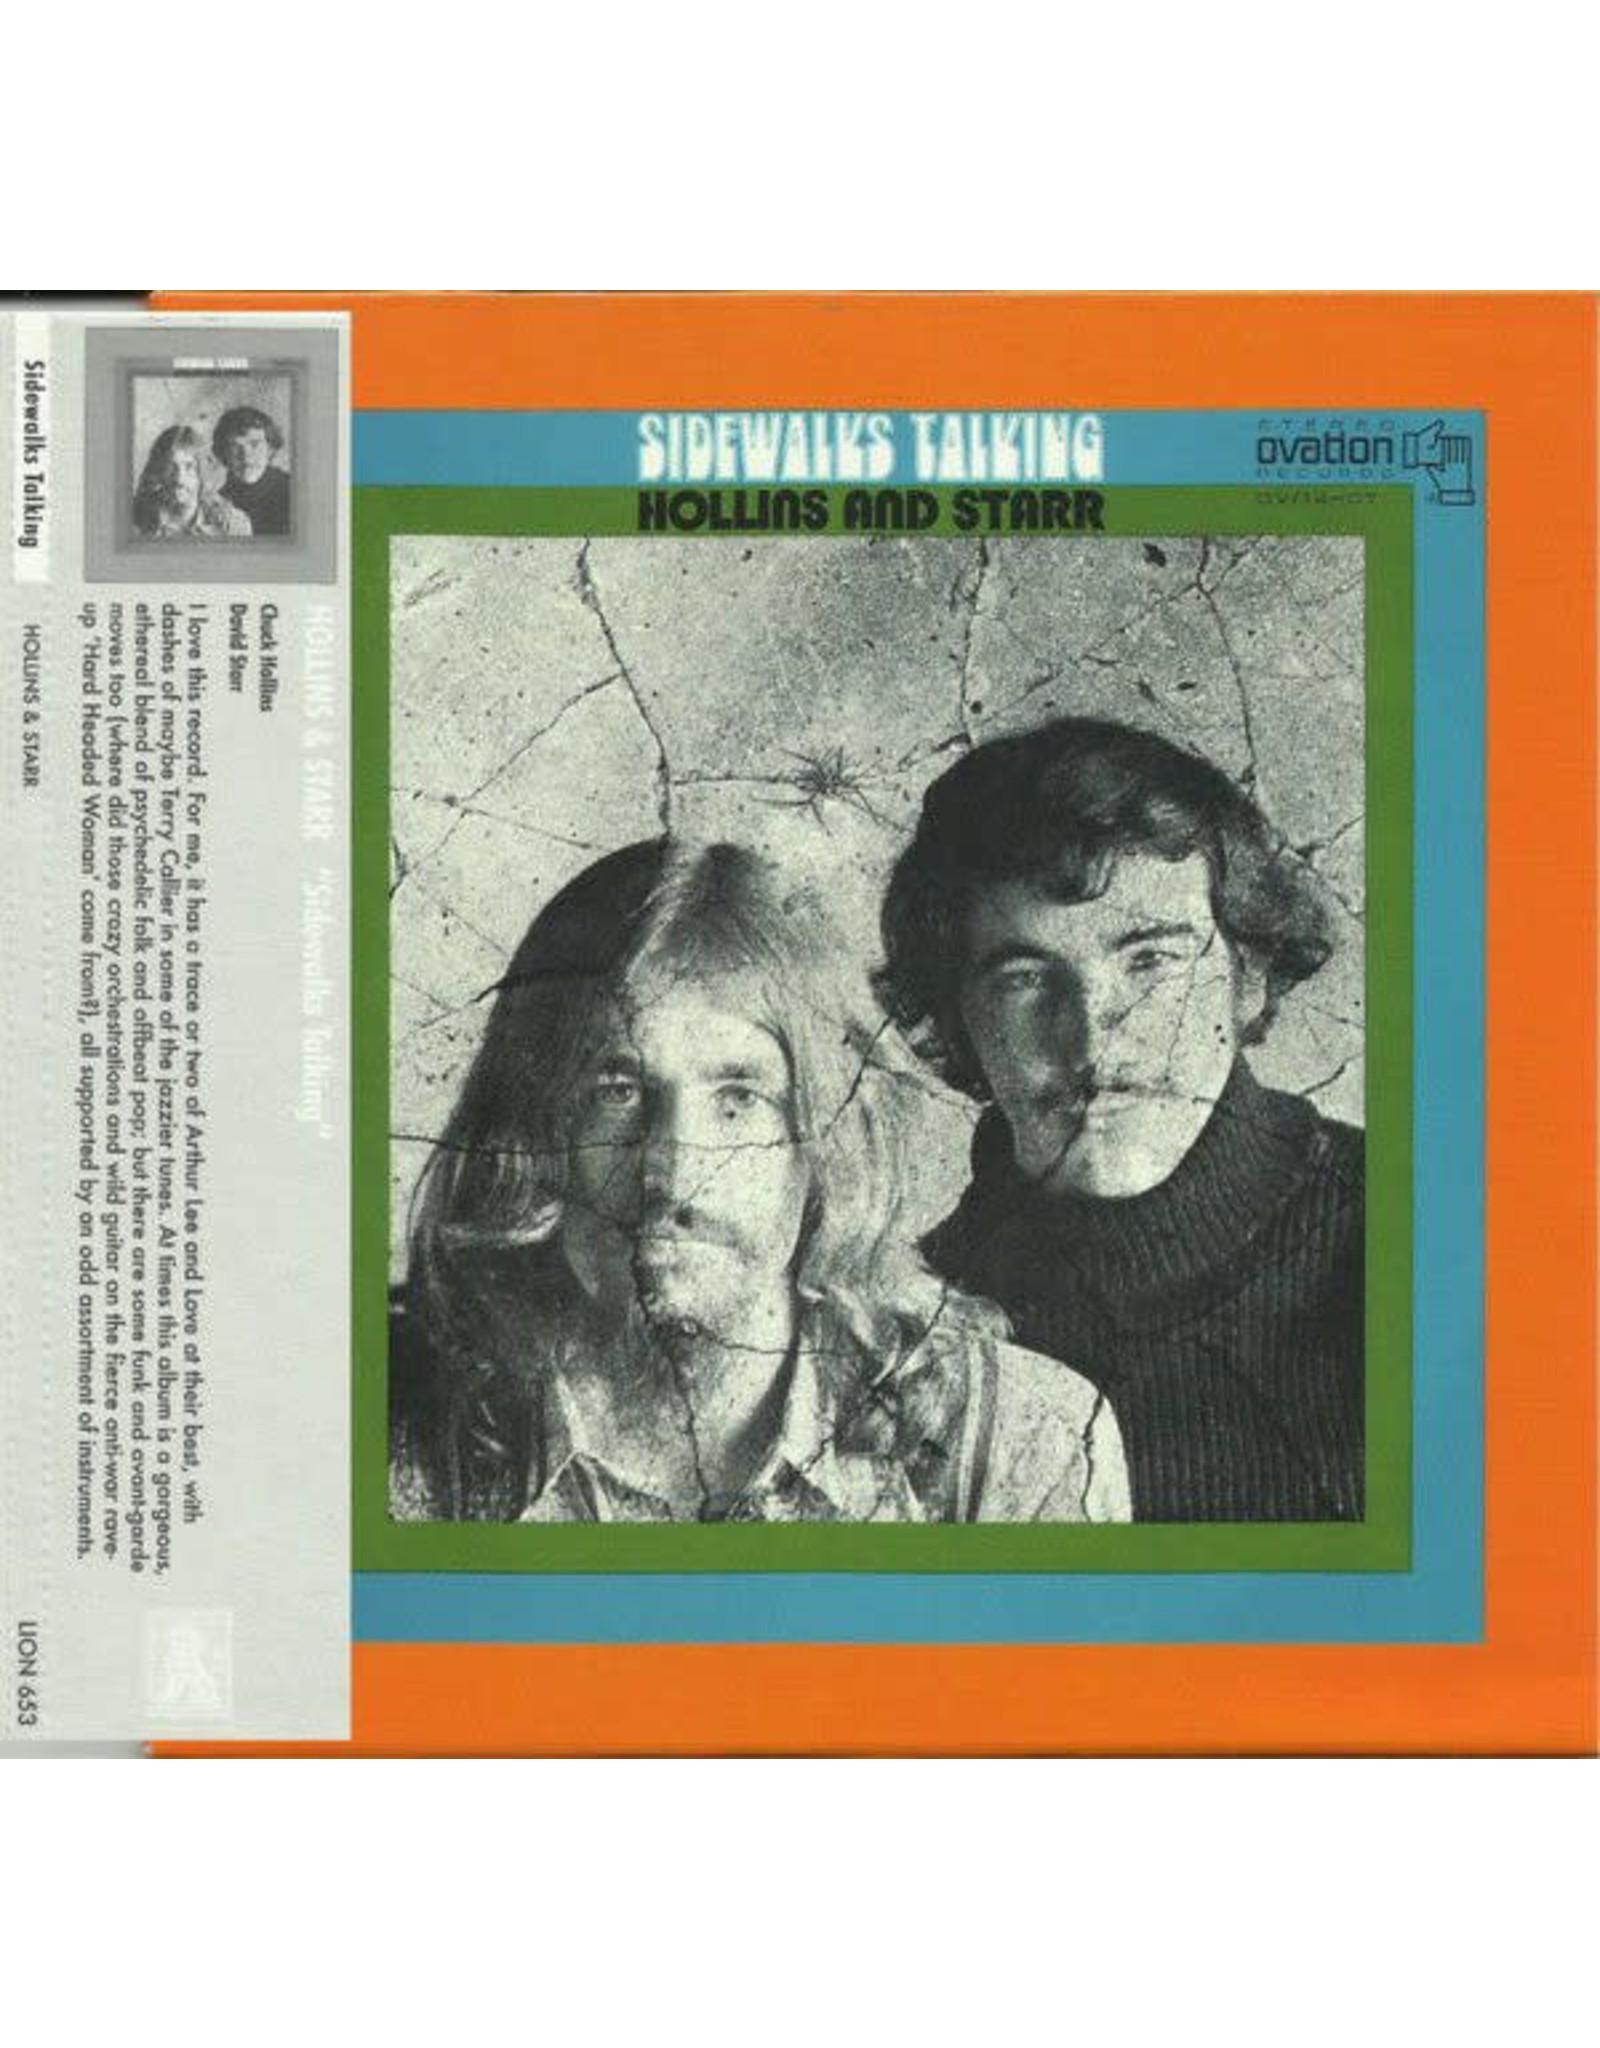 Hollins & Starr - Sidewalks Talking CD